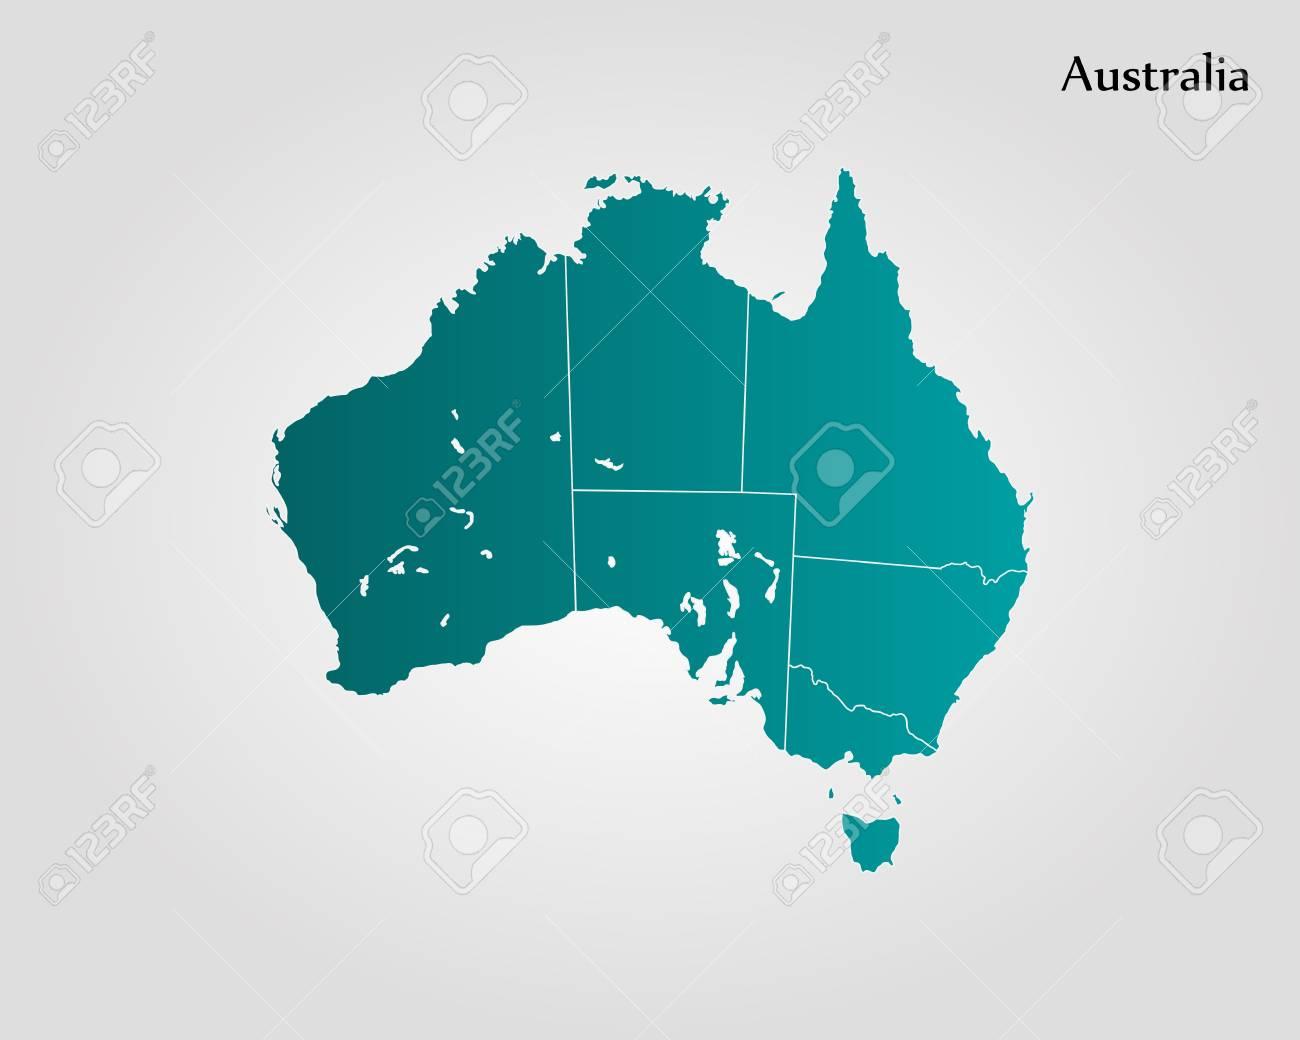 Australia Map Of The World.Map Of Australia Vector Illustration World Map